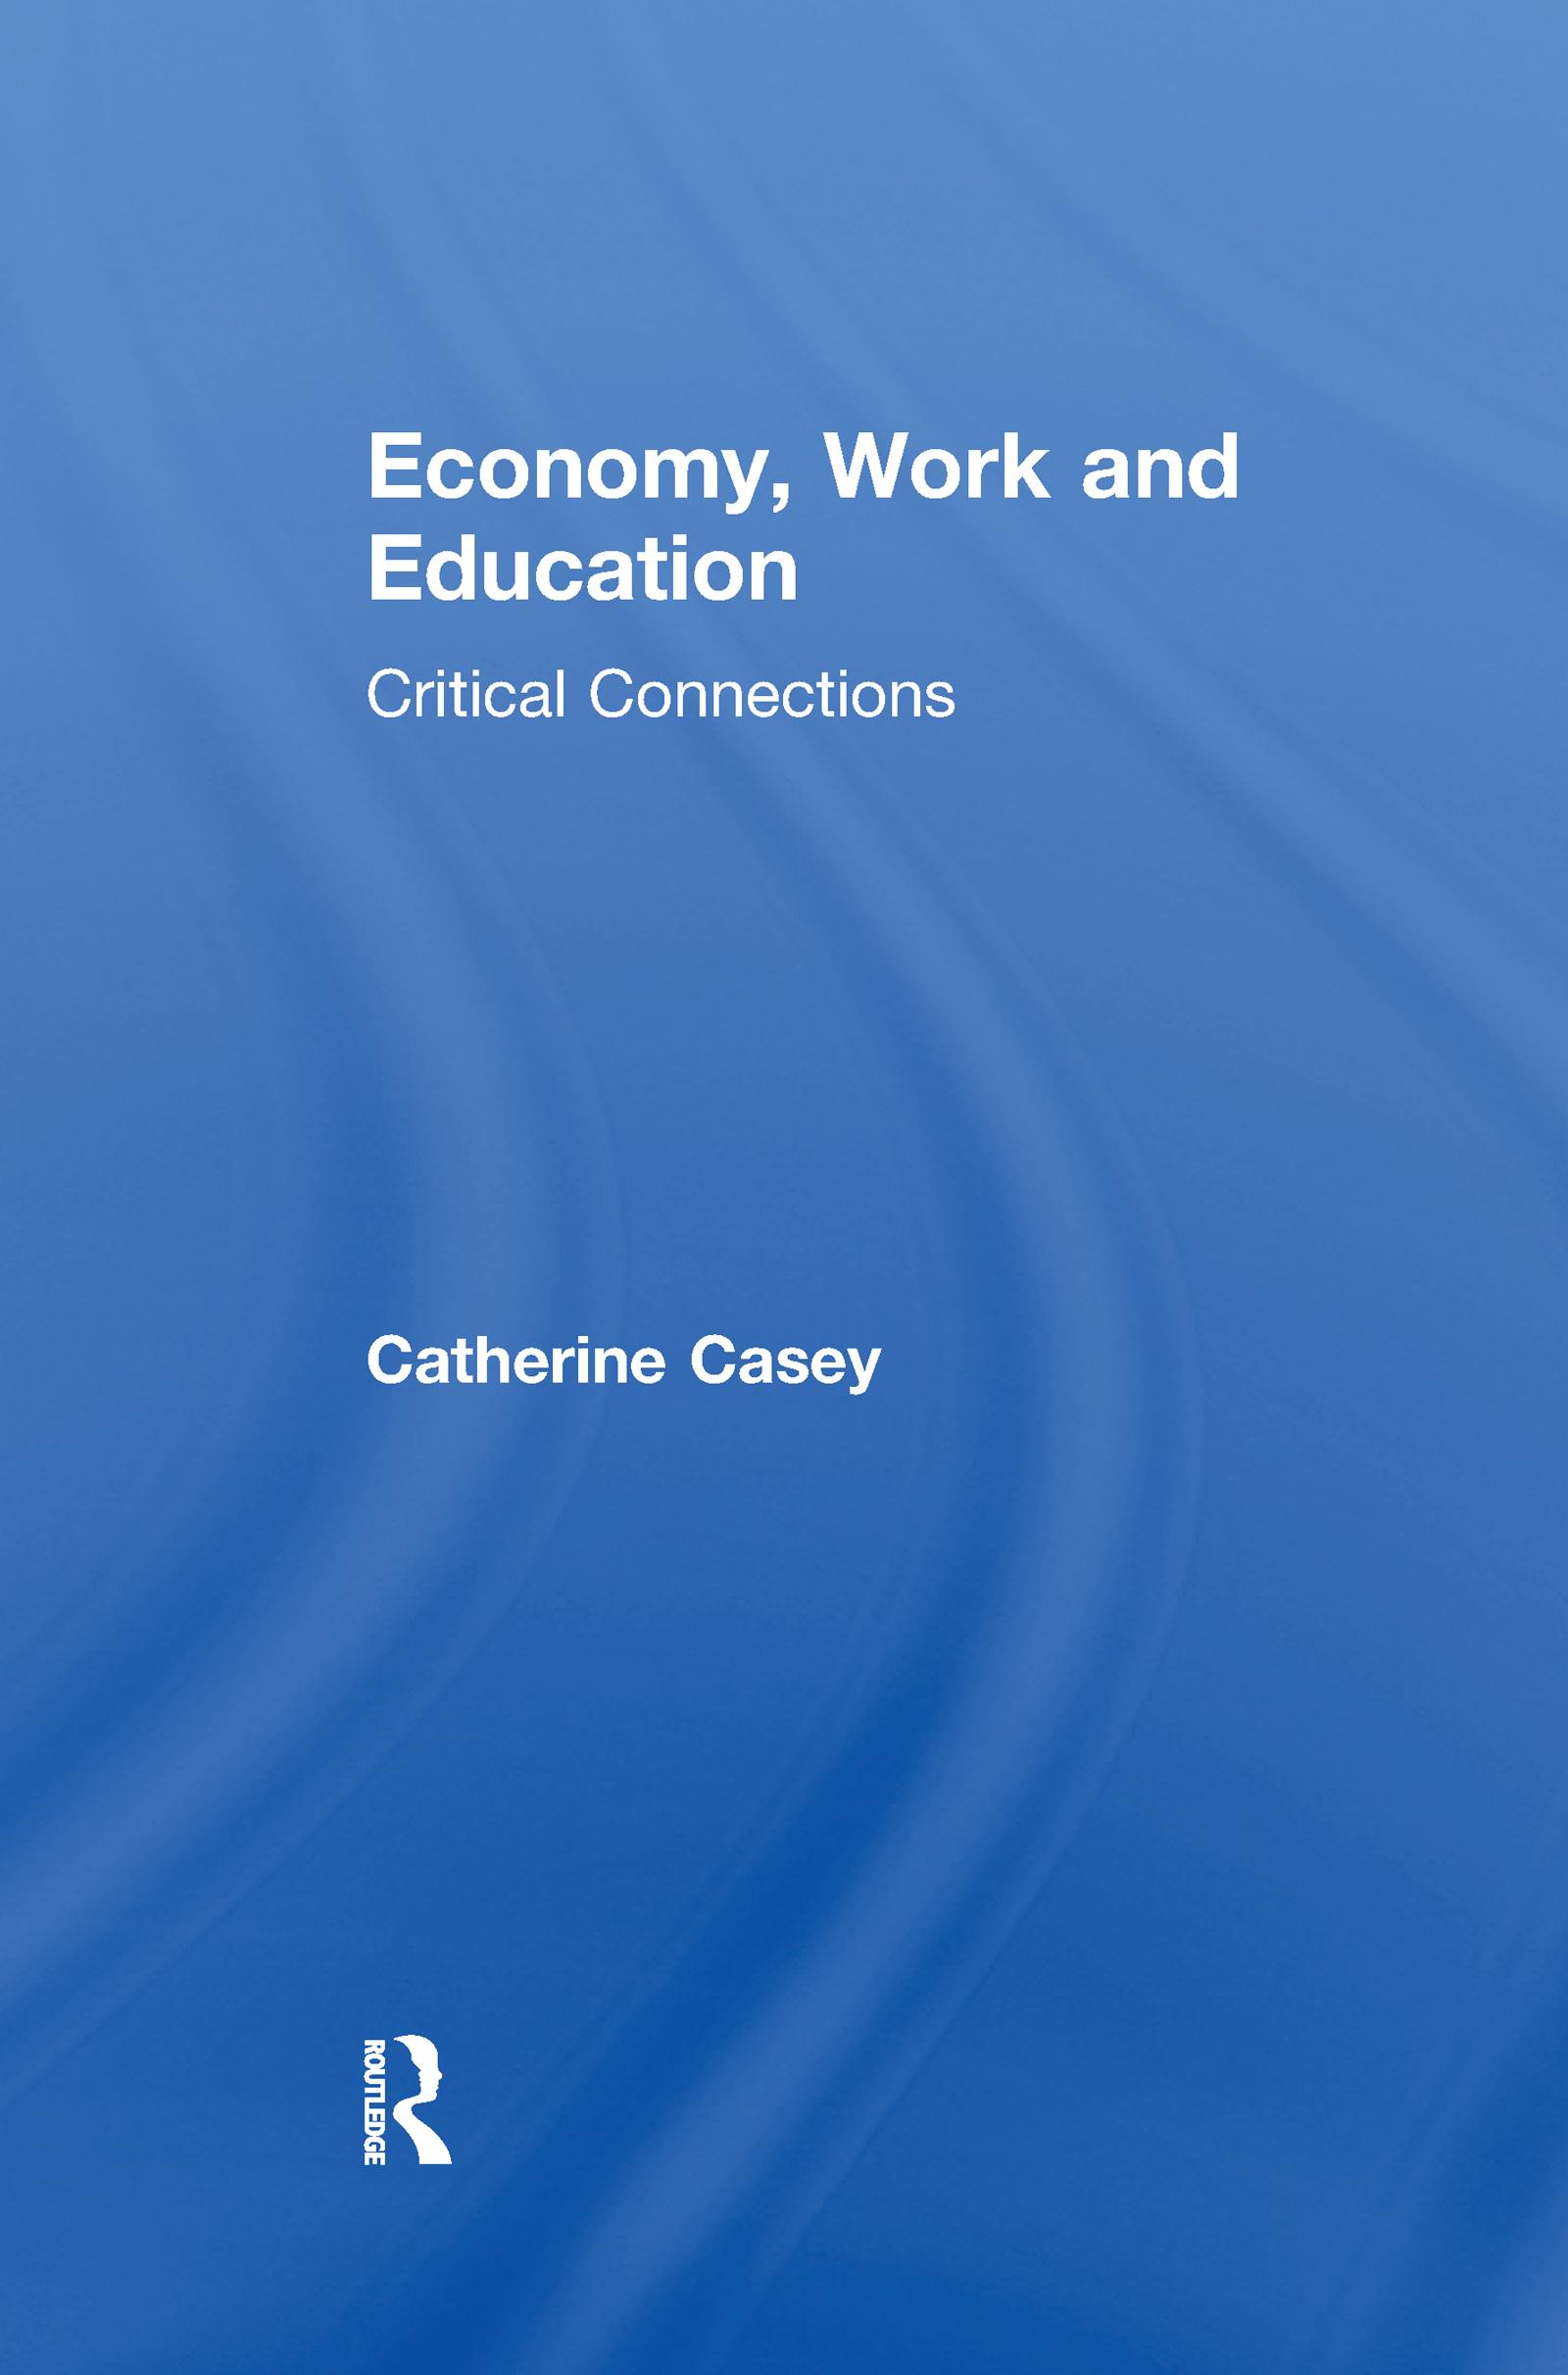 Economy, Work, and Education